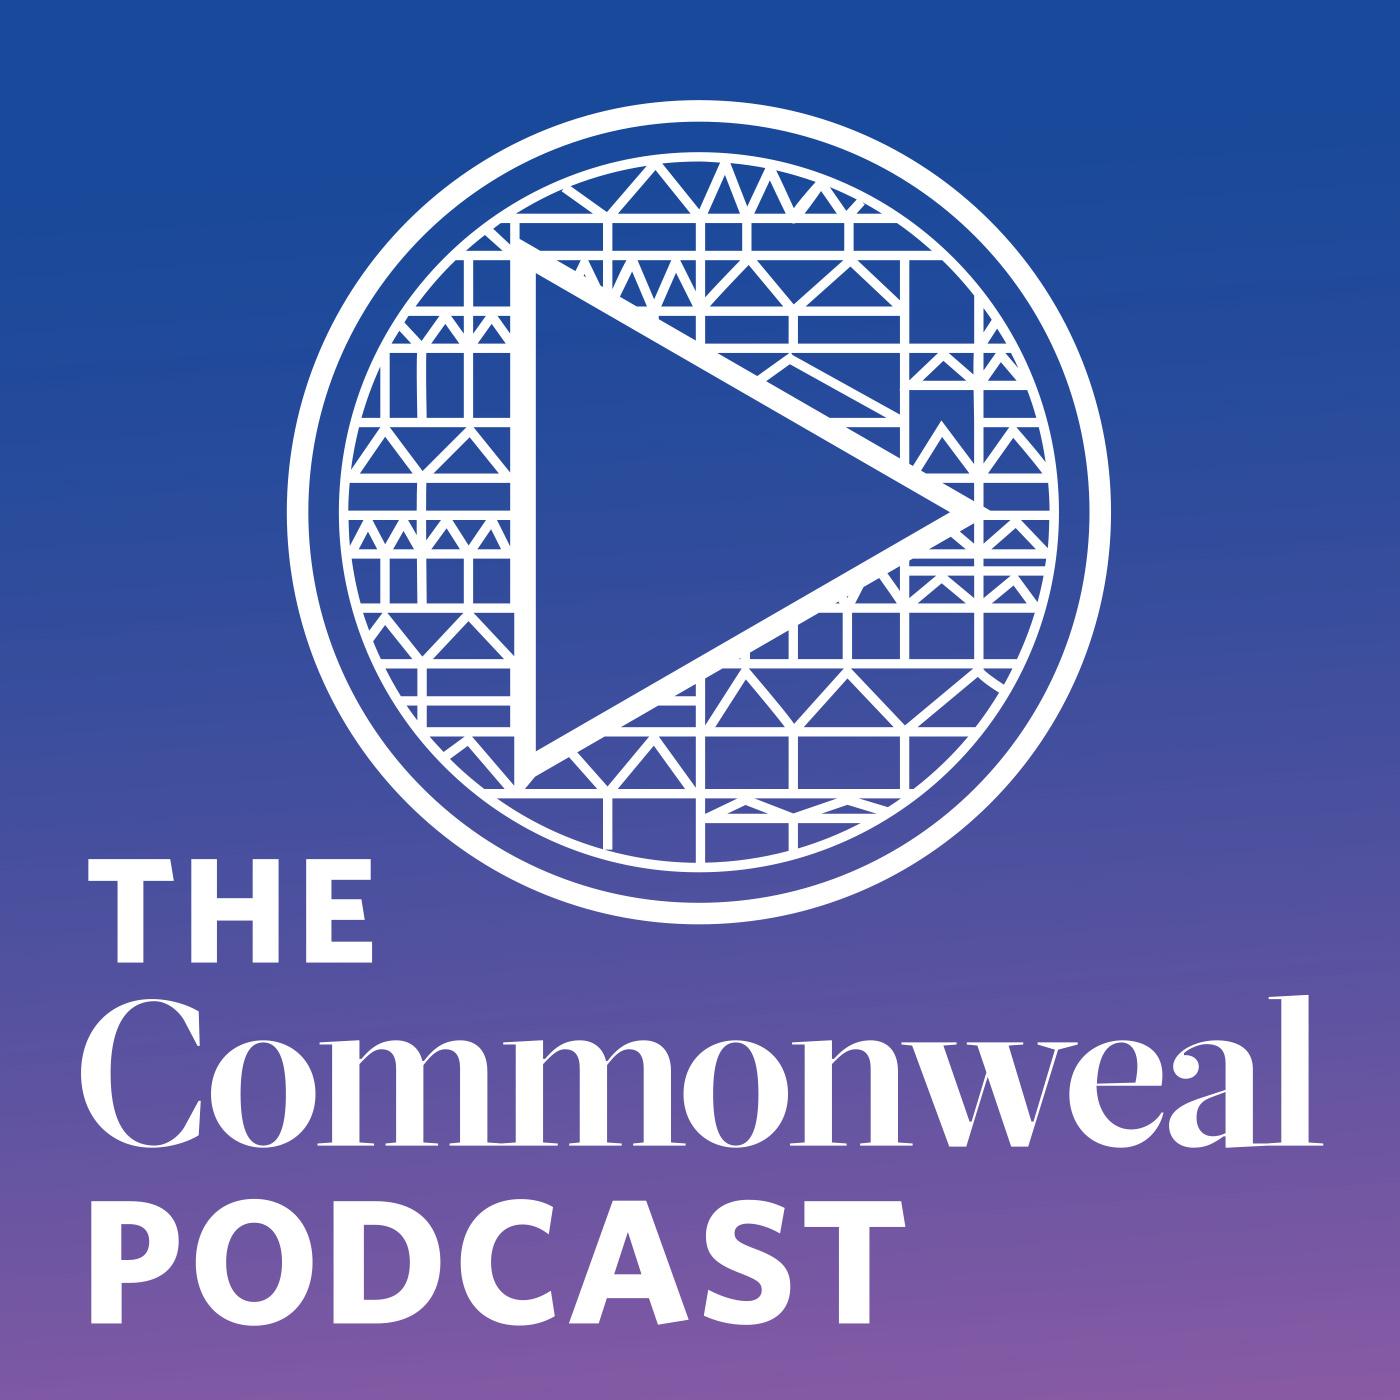 CommonwealPodcast_CoverArt.jpg